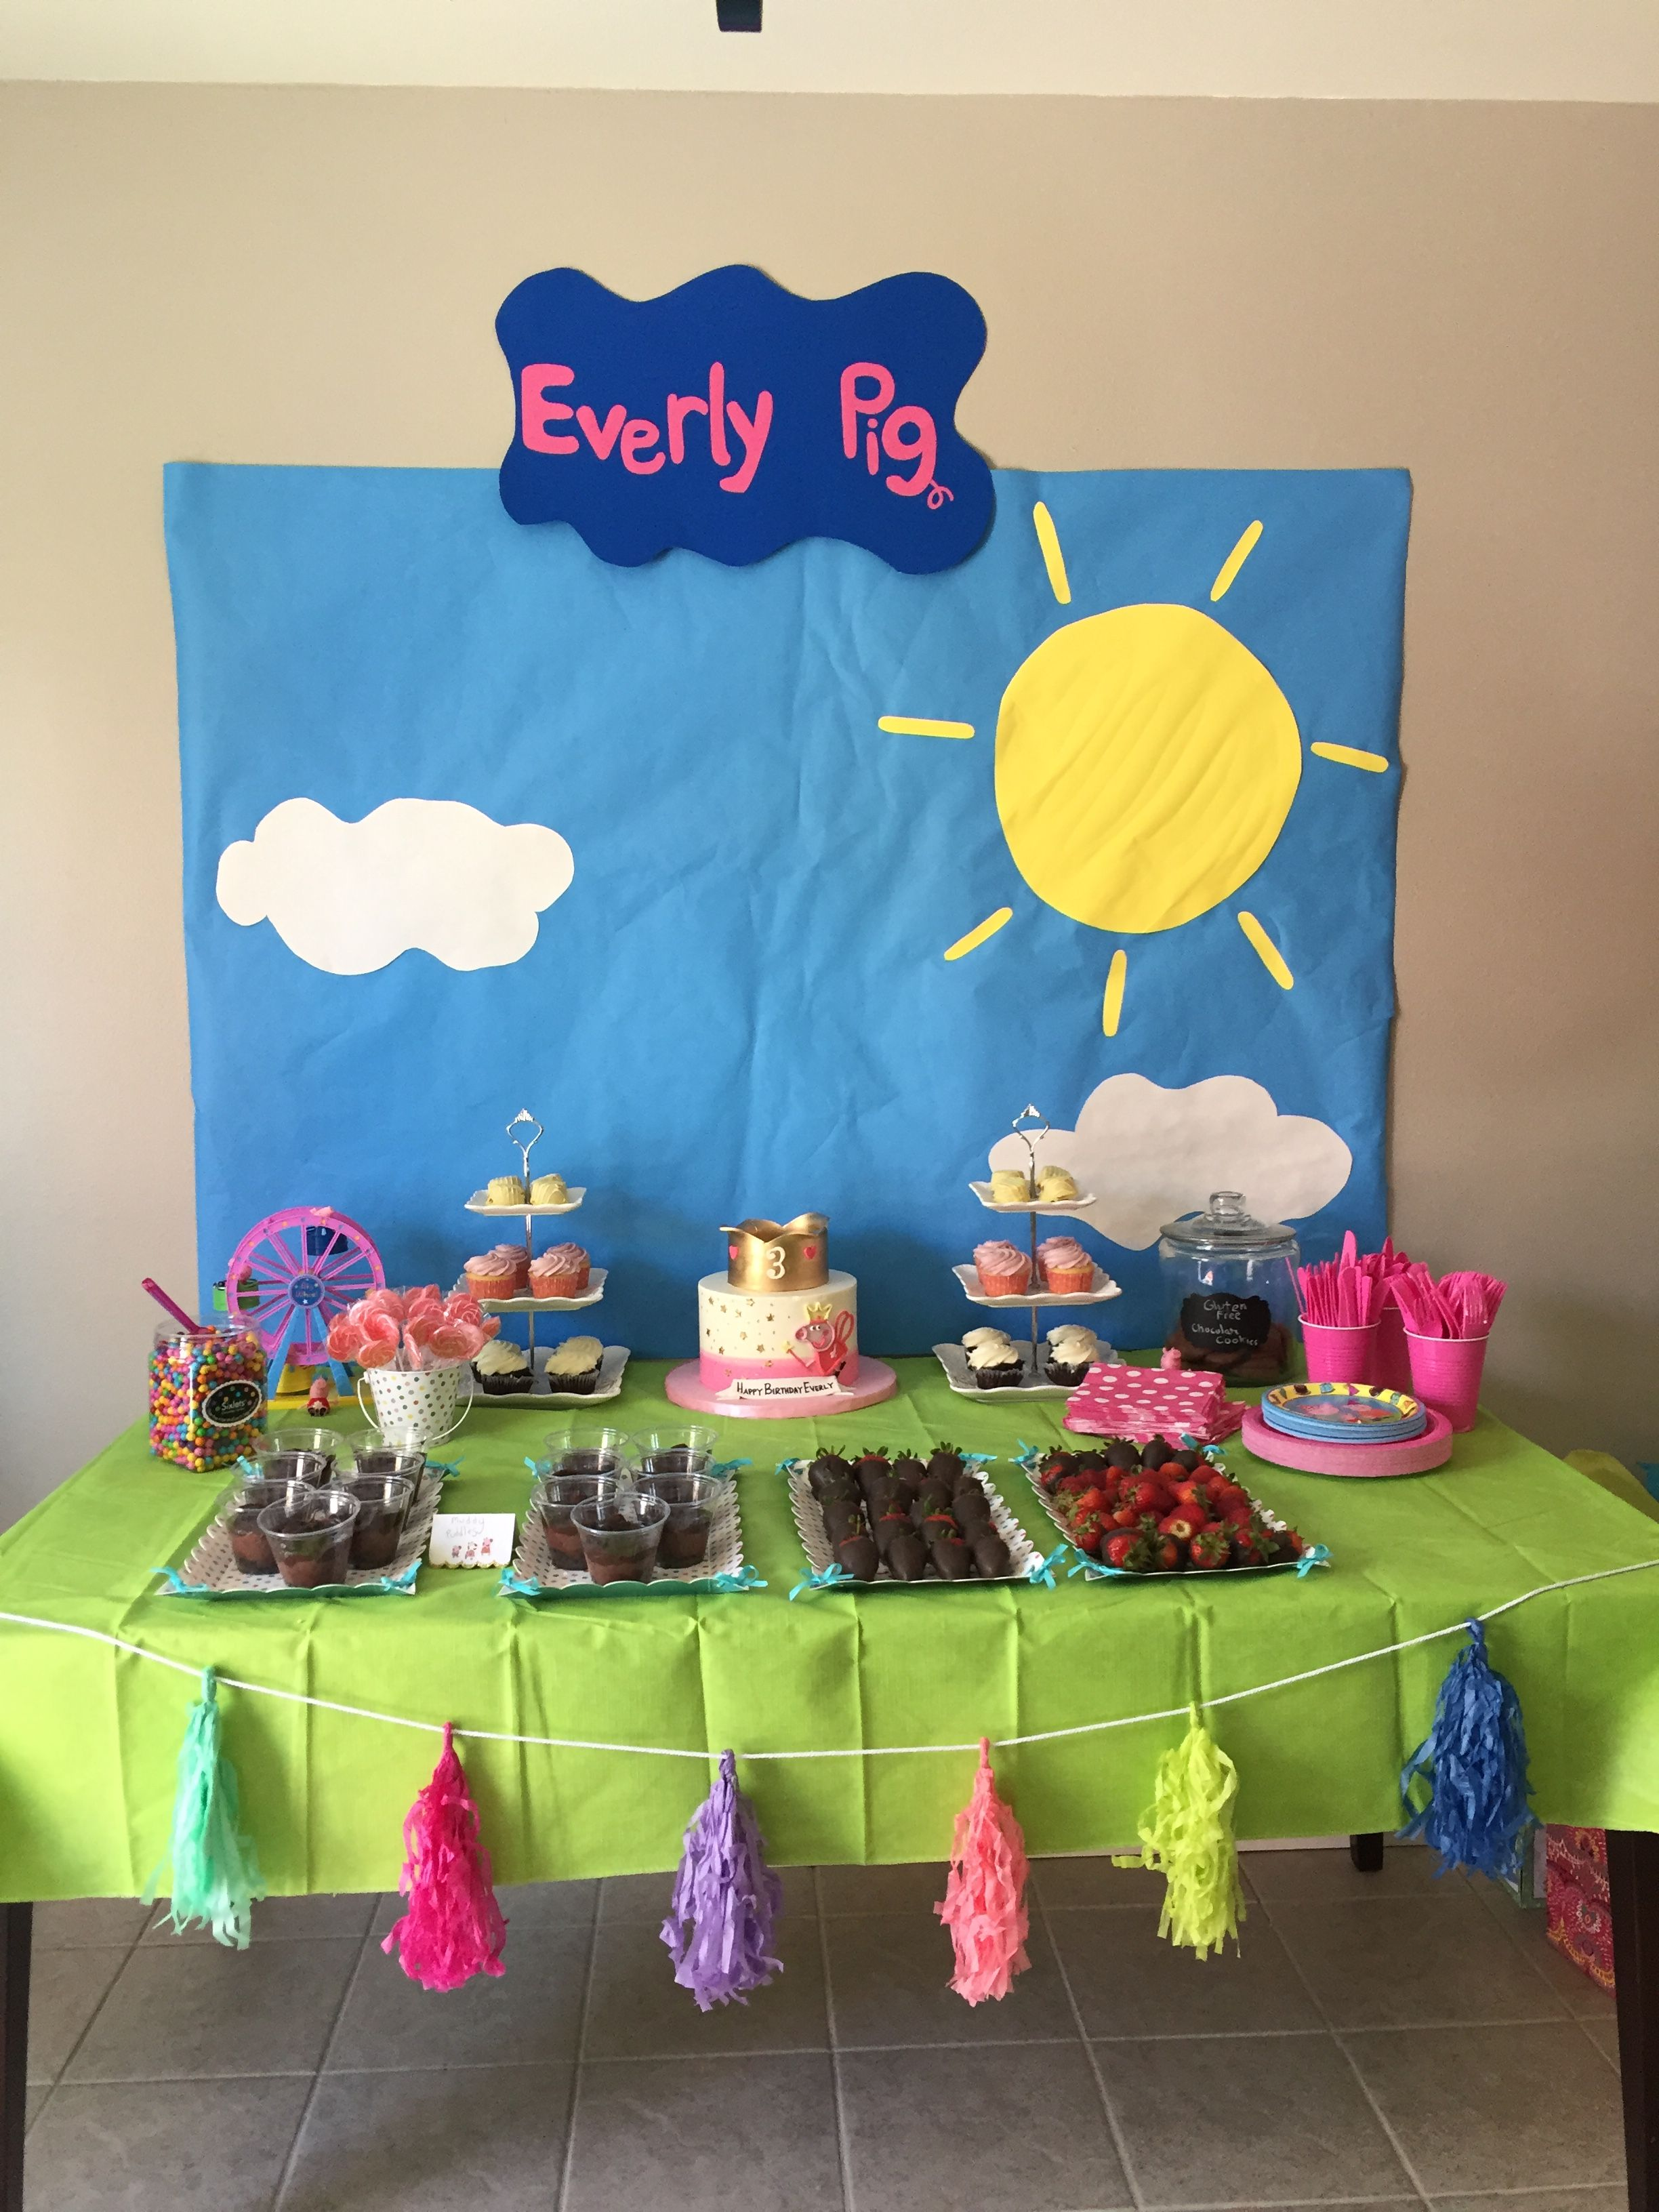 Diy Peppa Pig Birthday Party Peppa Pig Birthday Party Decorations Pig Birthday Party Decorations Peppa Pig Birthday